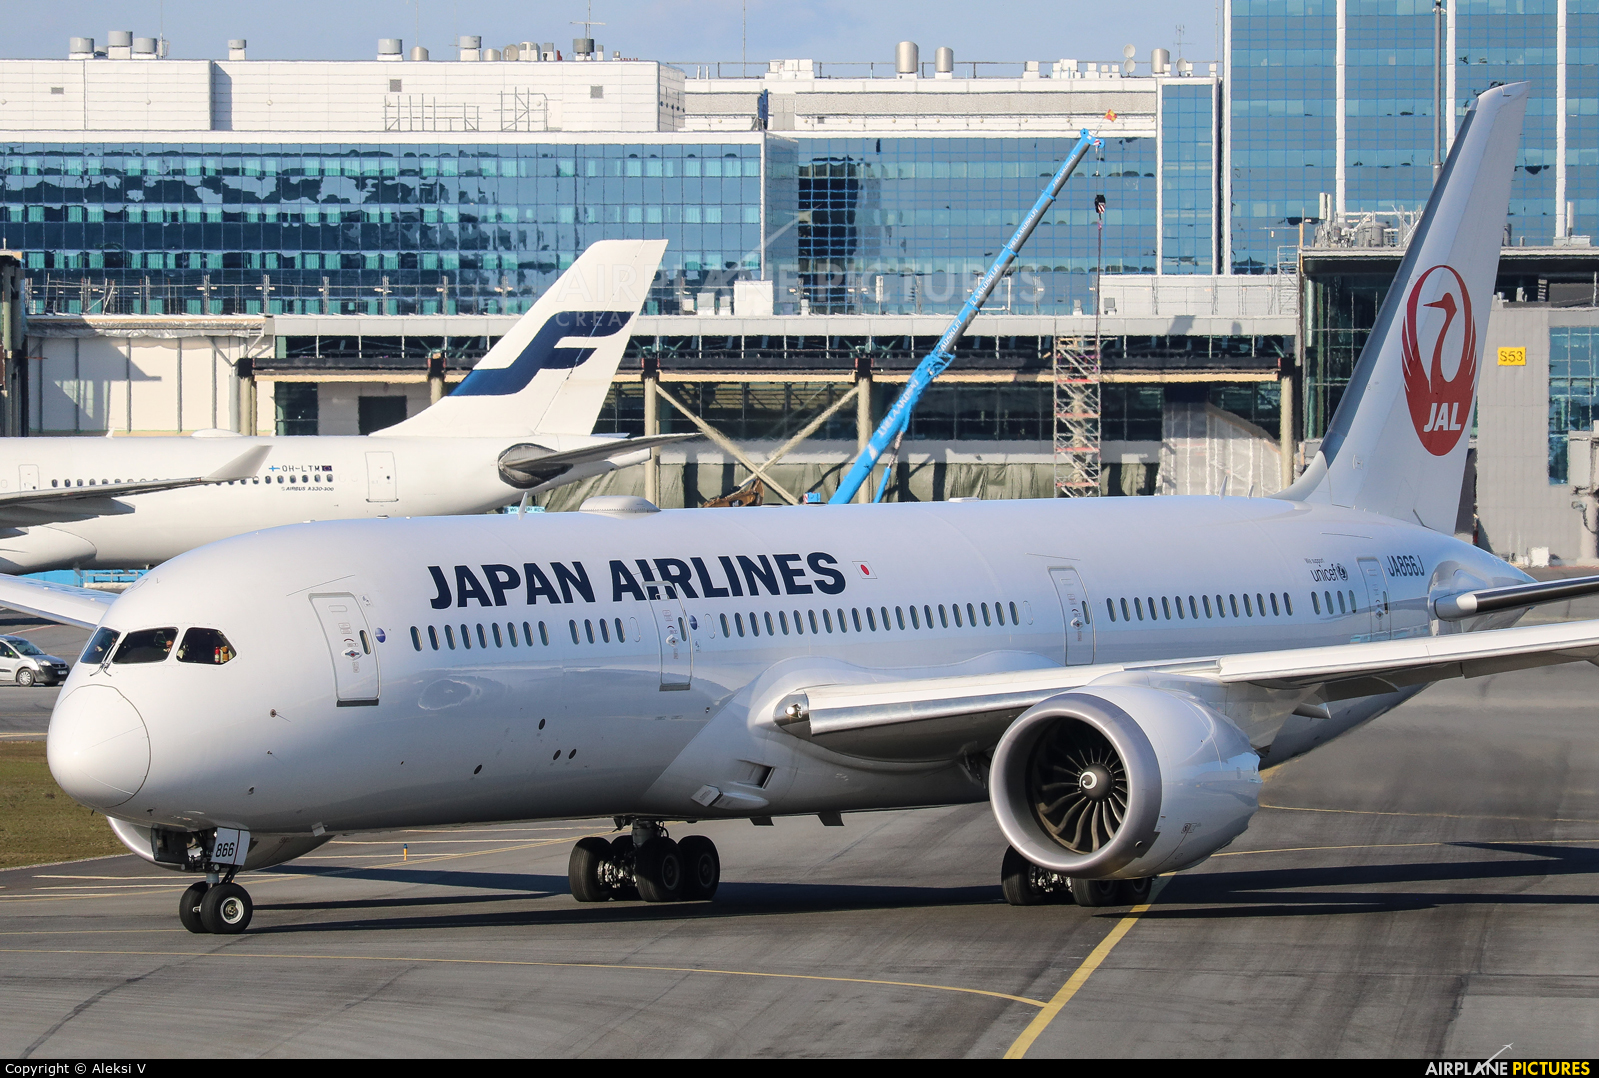 JAL - Japan Airlines JA866J aircraft at Helsinki - Vantaa